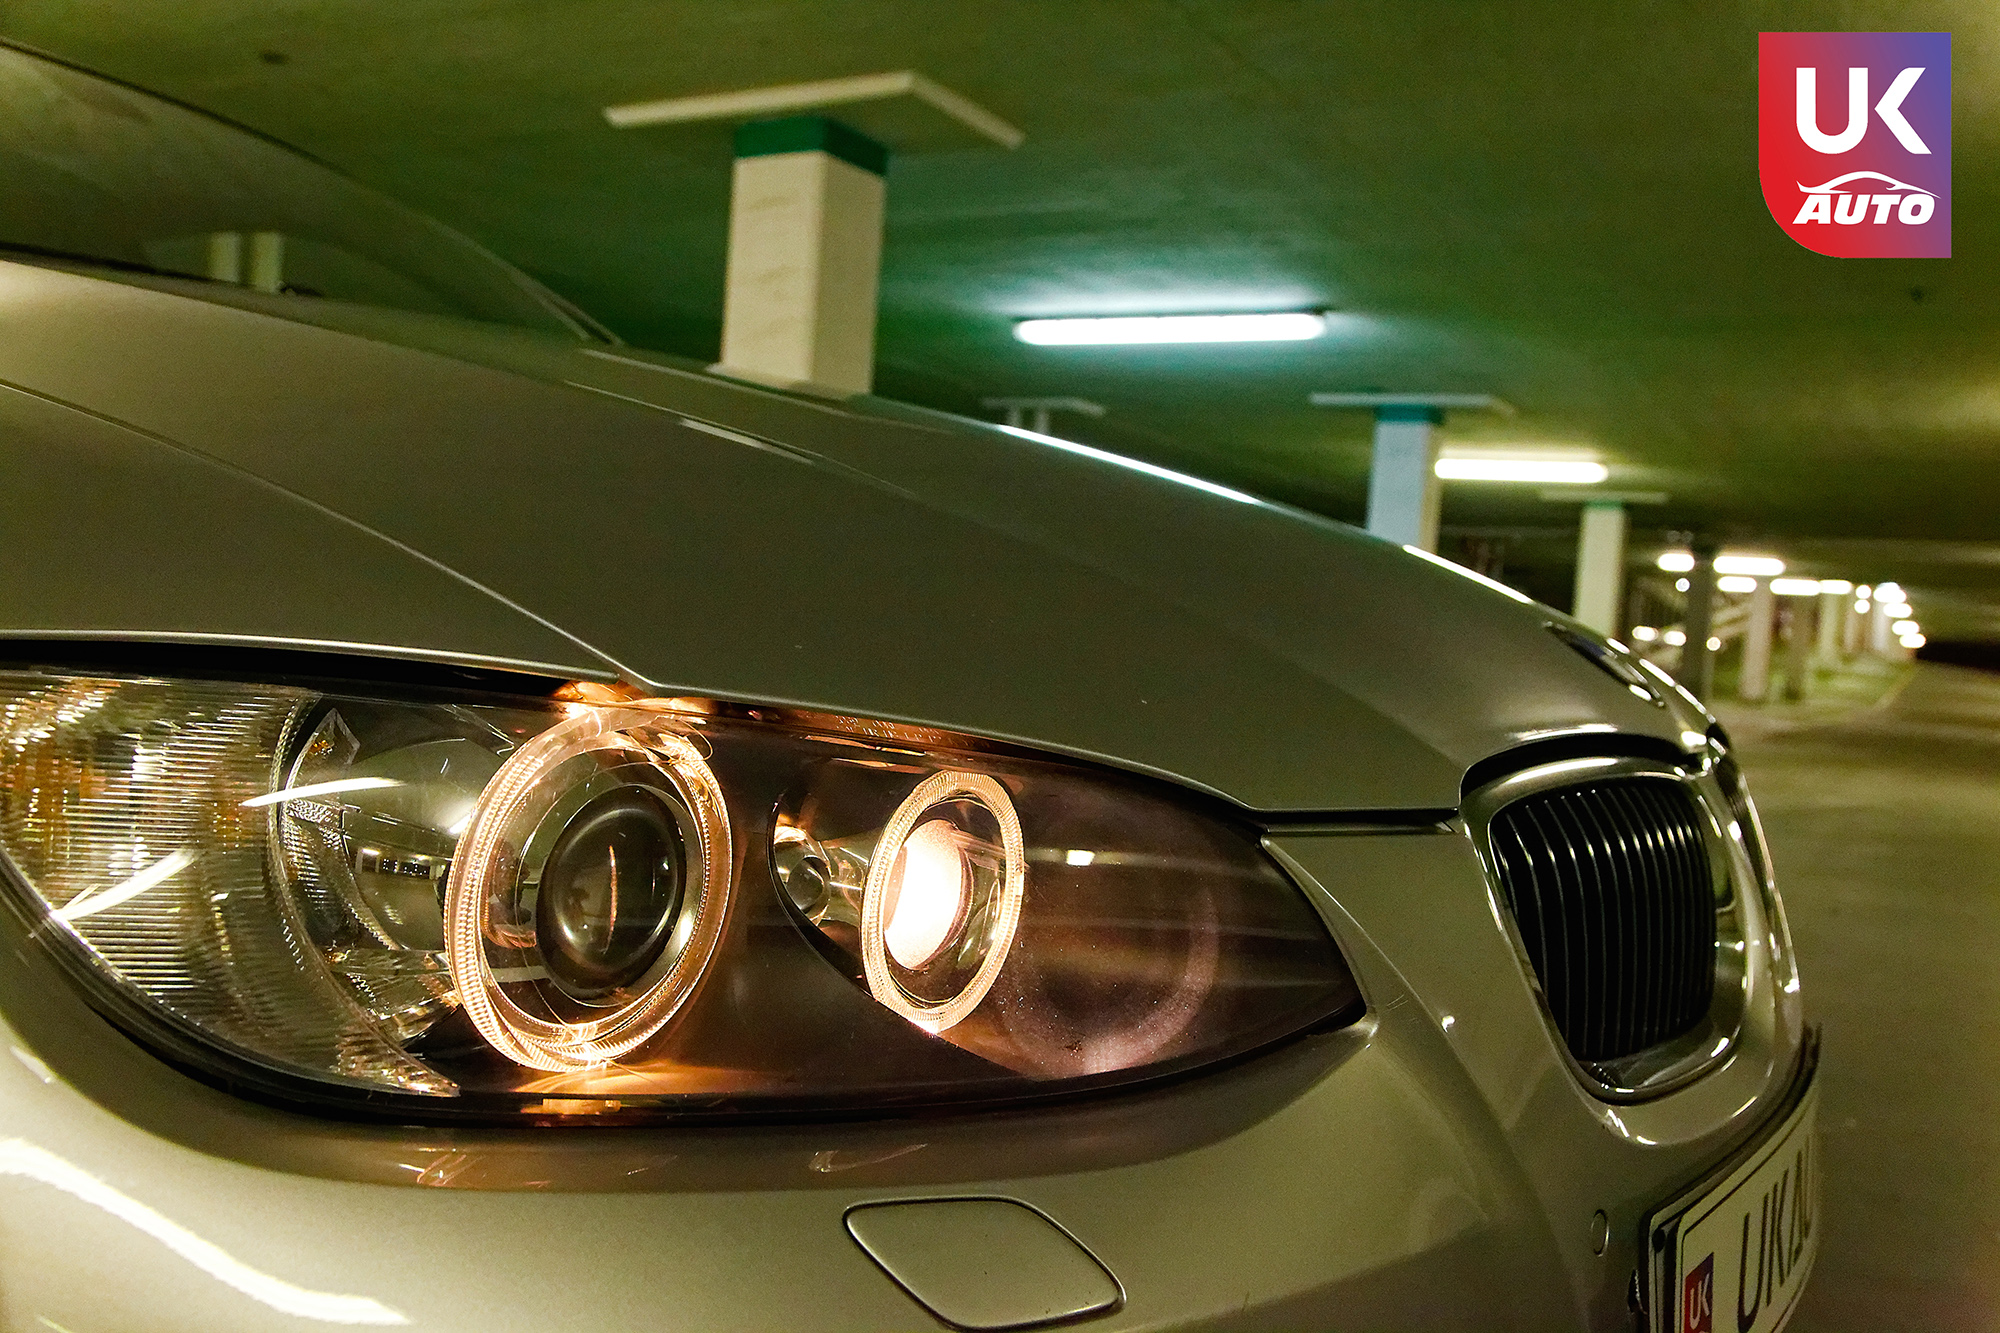 Bmw 335i rhd import uk bmw occasion bmw mandataire e92 rhd coupe uk auto uk ukauto10 - Felecitation a Julien pour cette BMW 335i E92 COUPE RHD importateur voitures anglaises